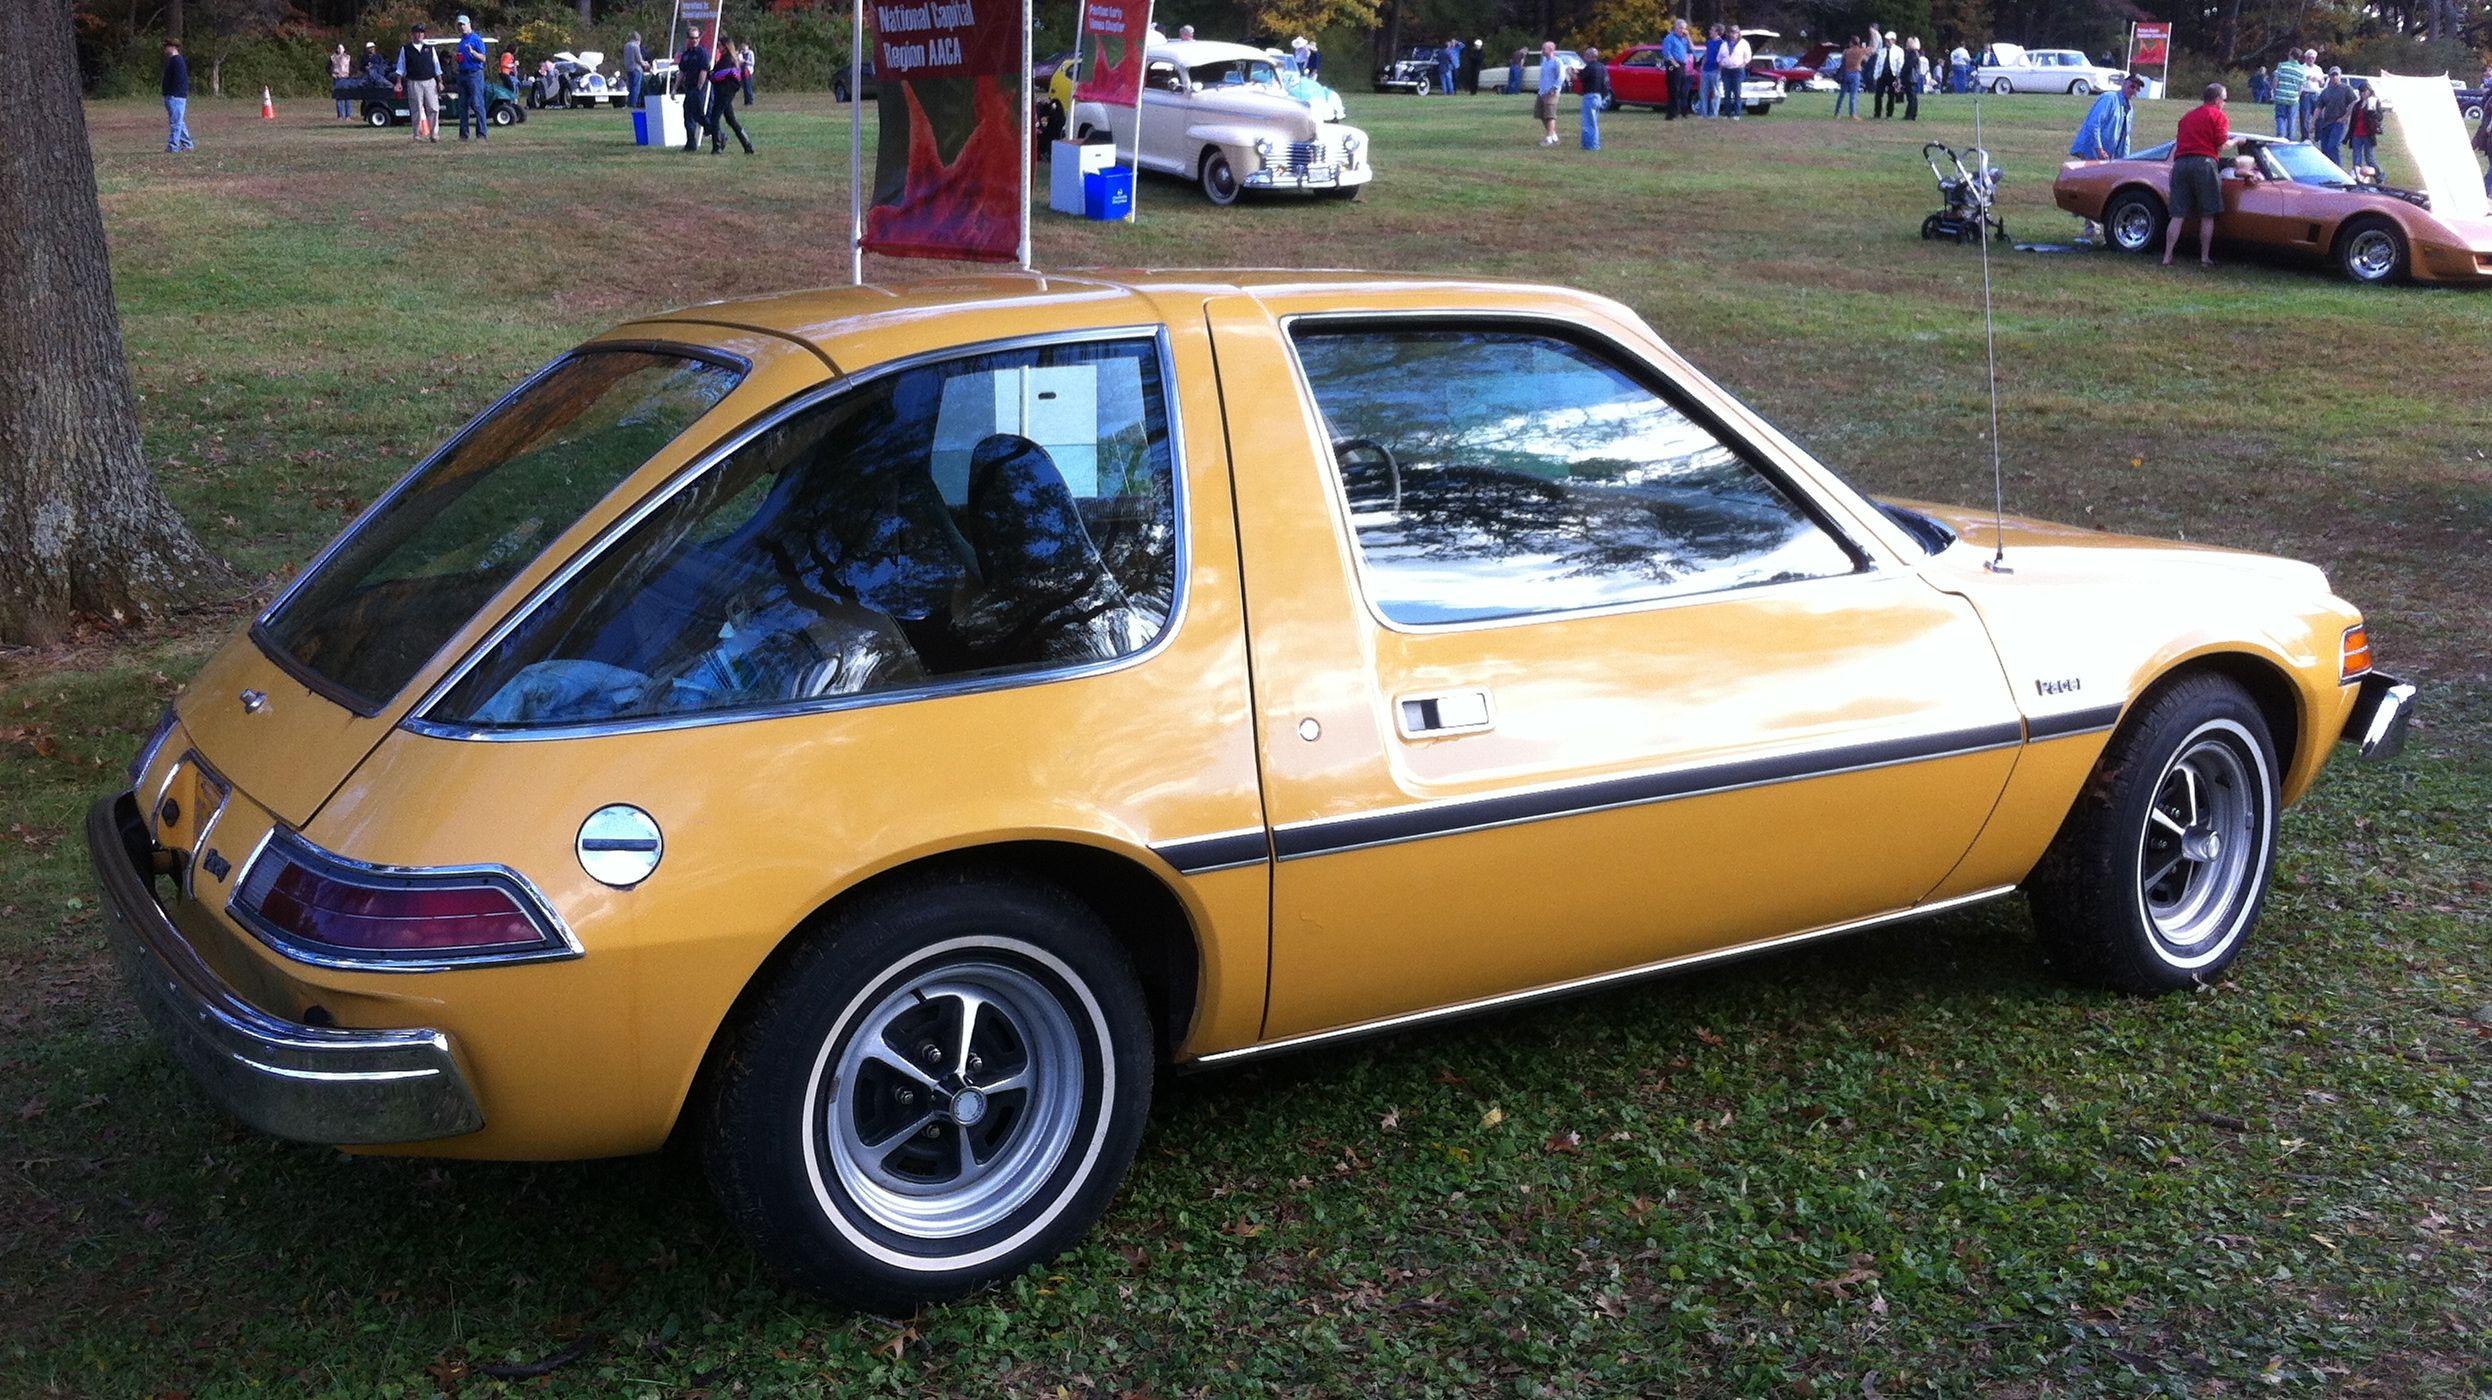 1975 Amc Pacer Base Model At 2012 Rockville S Jpg 2 492 1 400 Pixels Amc Weird Cars Oldsmobile